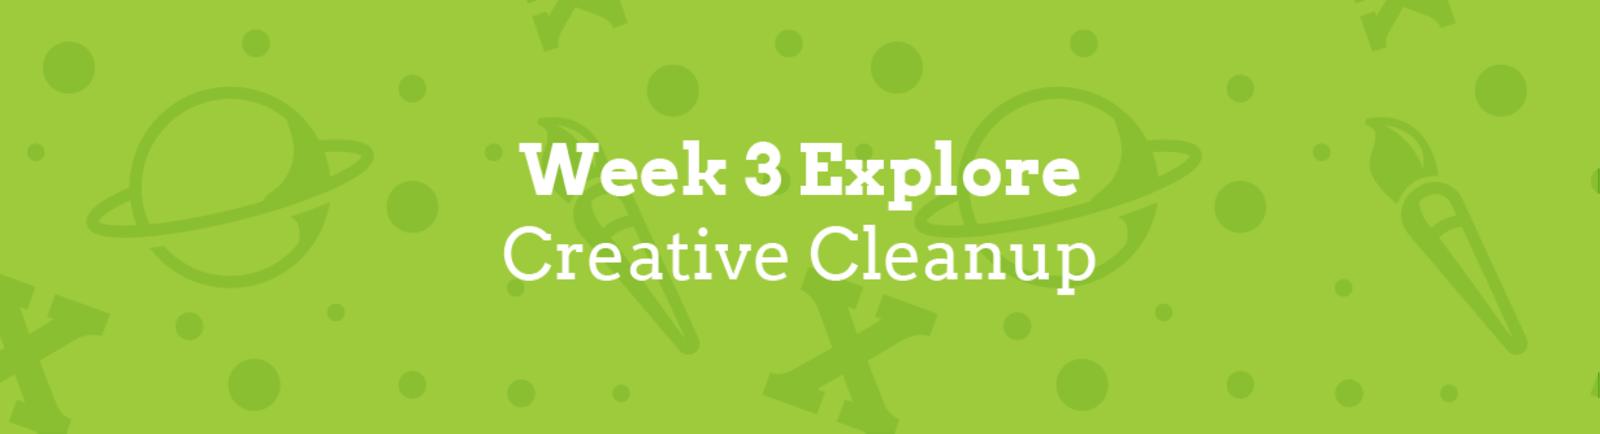 Week 3 Explore: Creative Cleanup